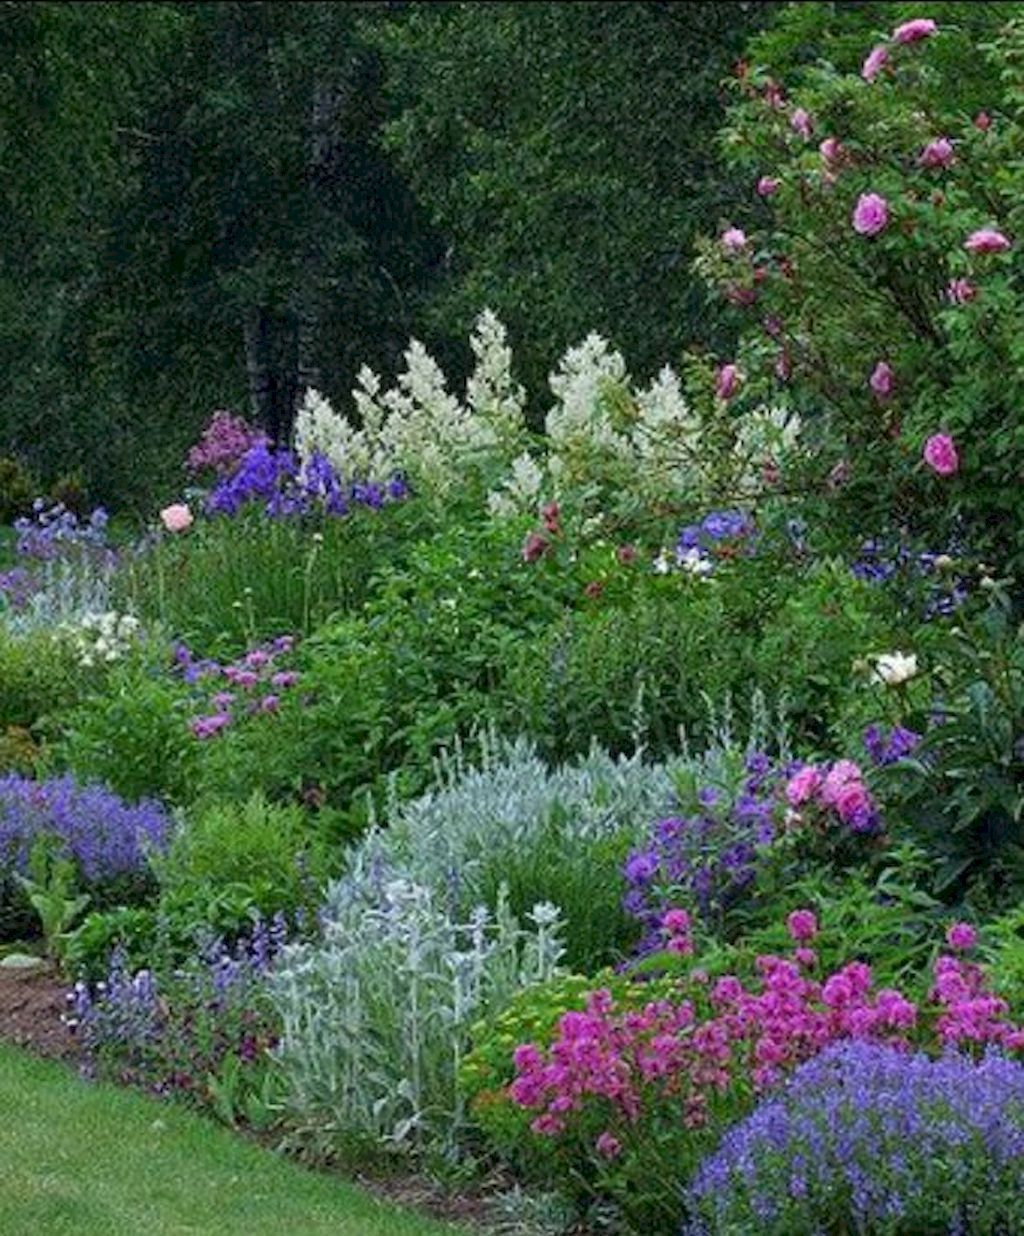 57 Amazing Beautiful Garden Ideas Inspiration And: 09 Beautiful Small Cottage Garden Ideas For Backyard